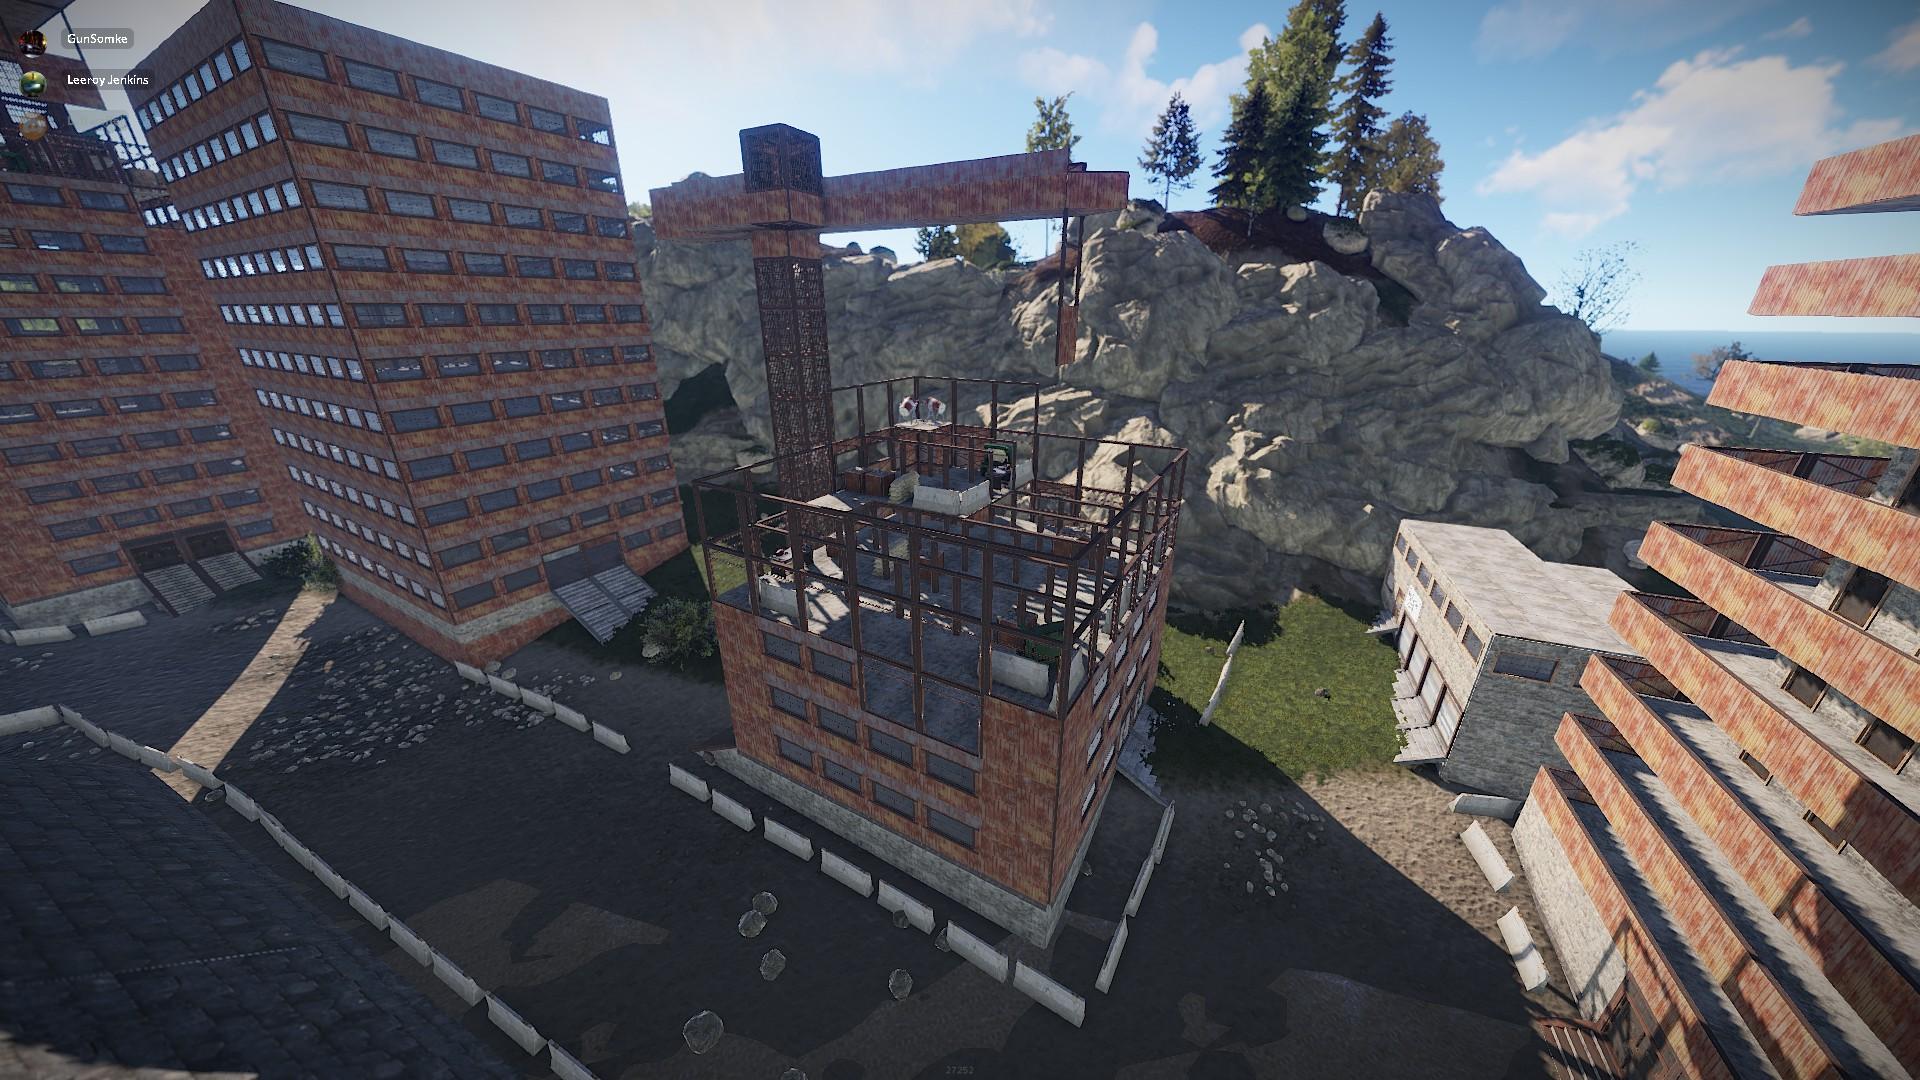 Rust - Rust